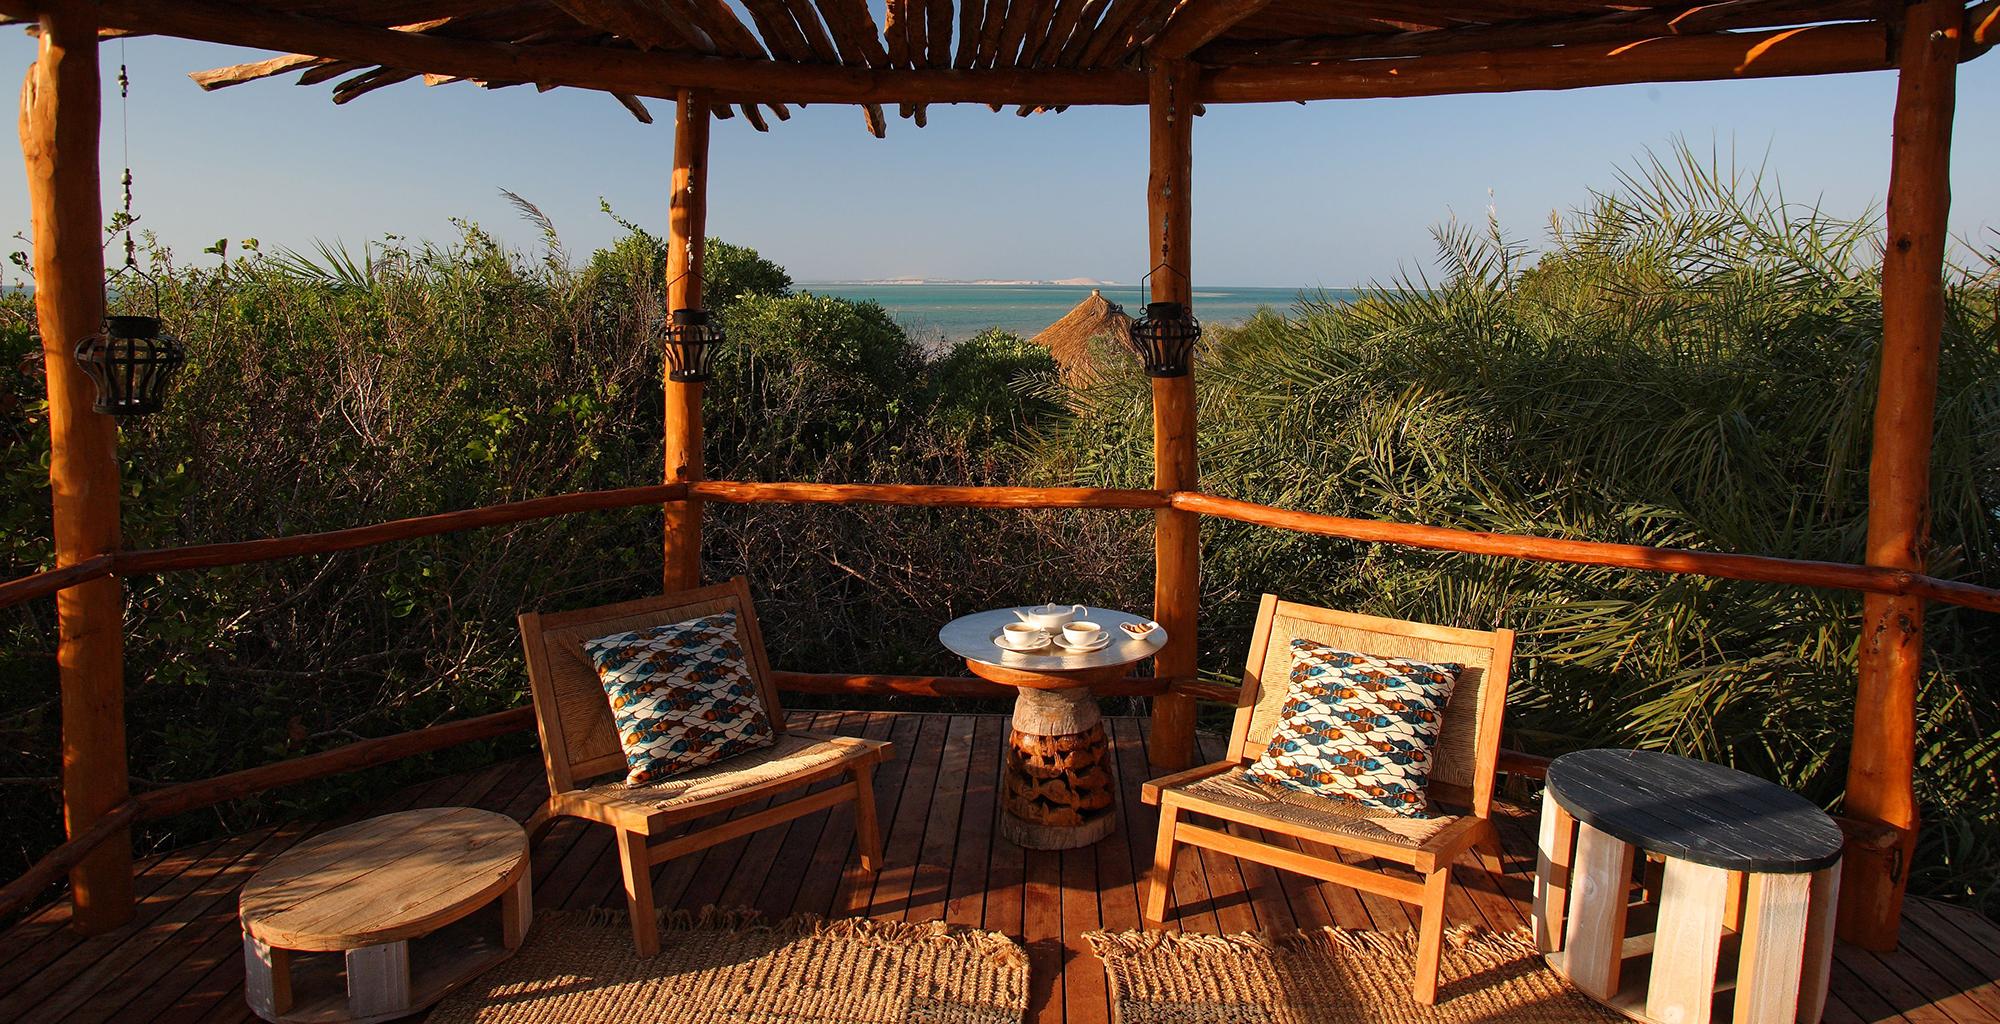 Mozambique-Bazaruto-Archipelago-Azura-Benguerra-Presidential-Deck